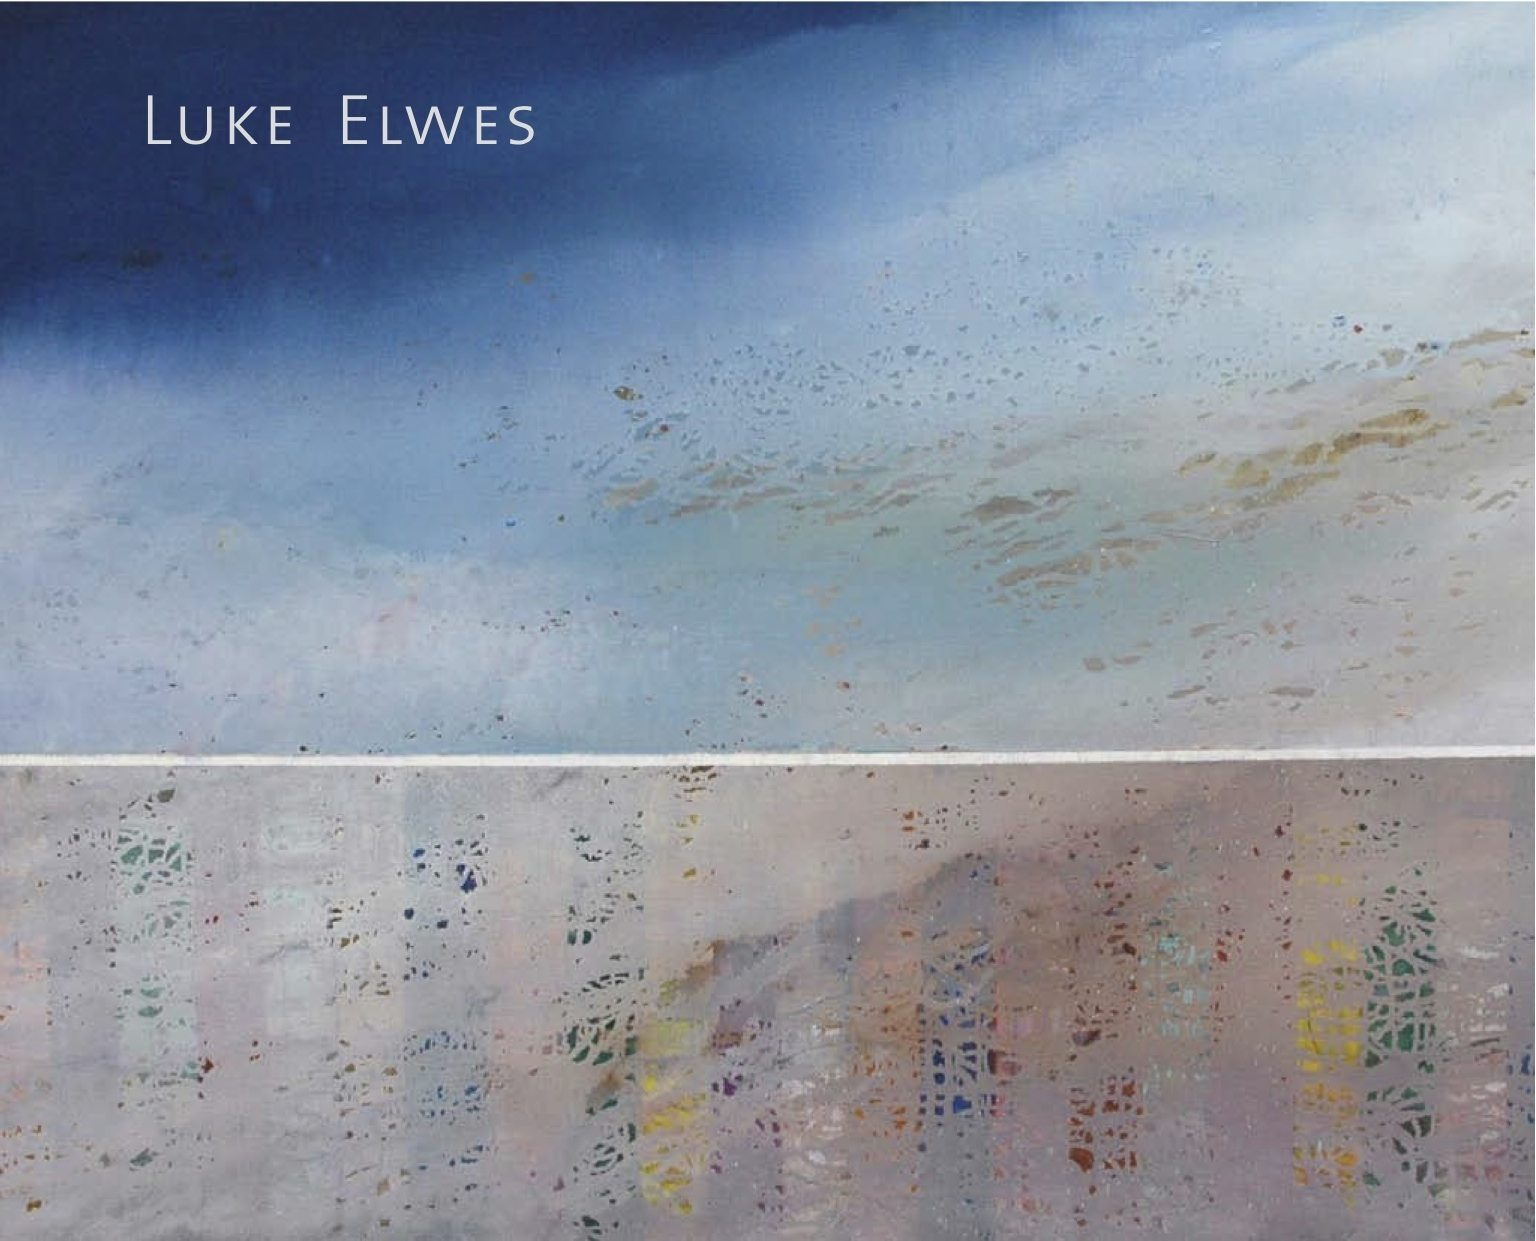 Luke Elwes card .jpg